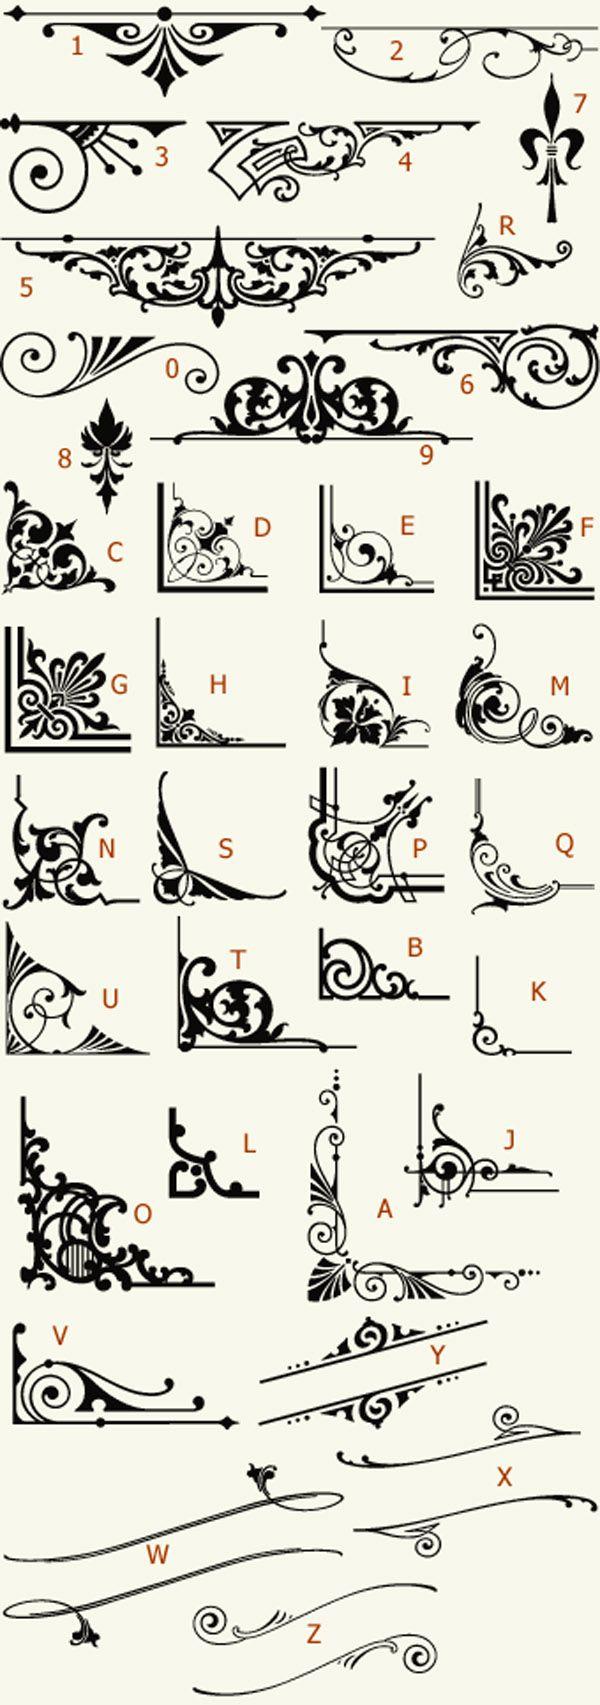 Americana Ornaments by Mike Jackson     http://www.letterheadfonts.com/fonts/americanaornaments.php